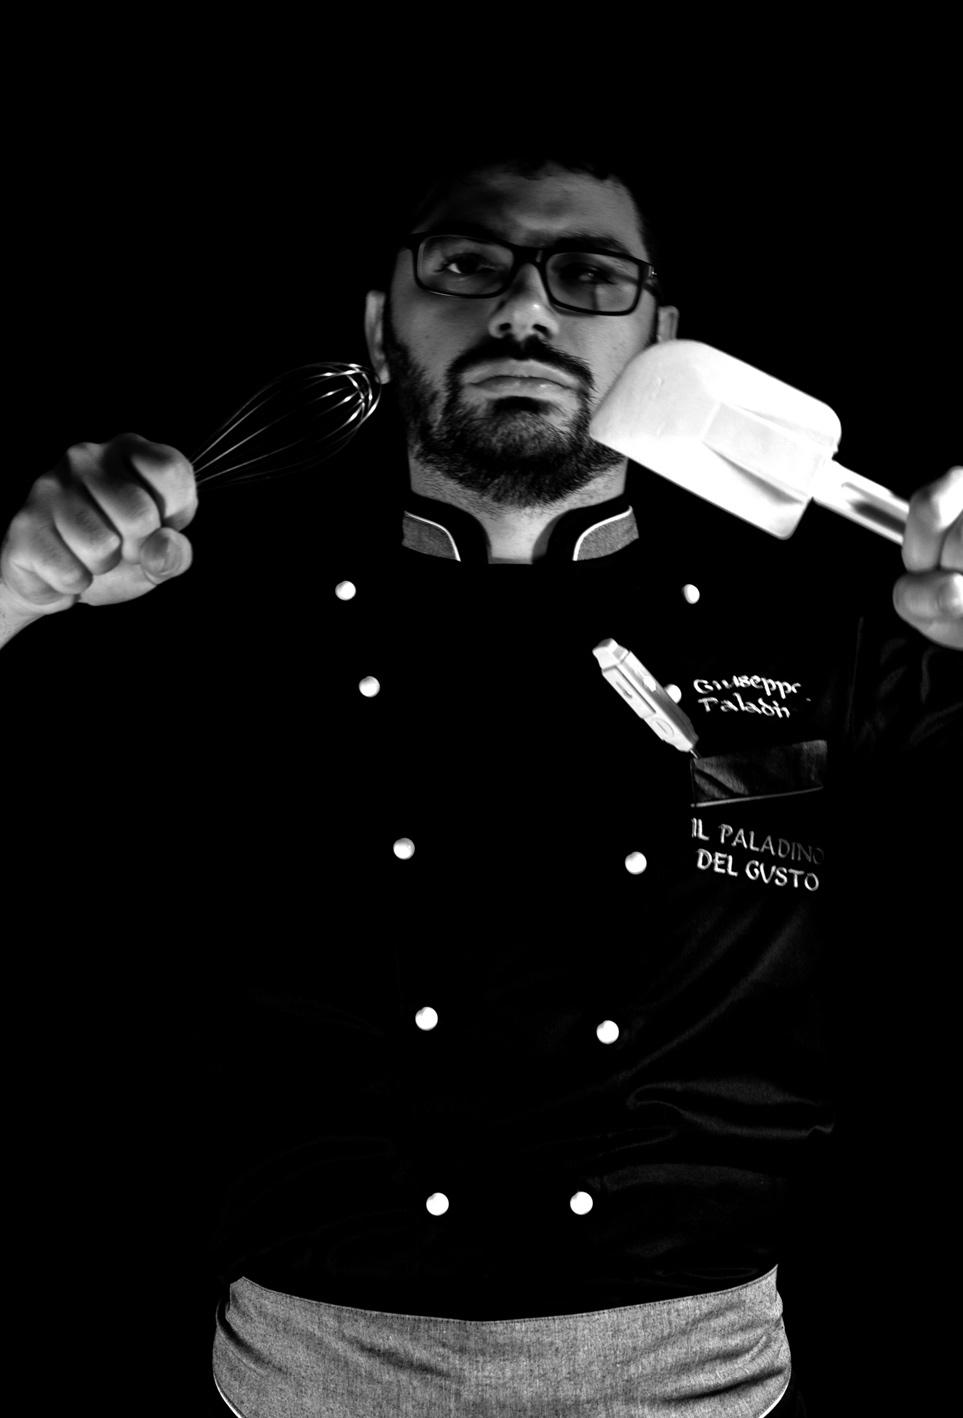 chef-giuseppe-paladino-ph_fotor-ritagliata_